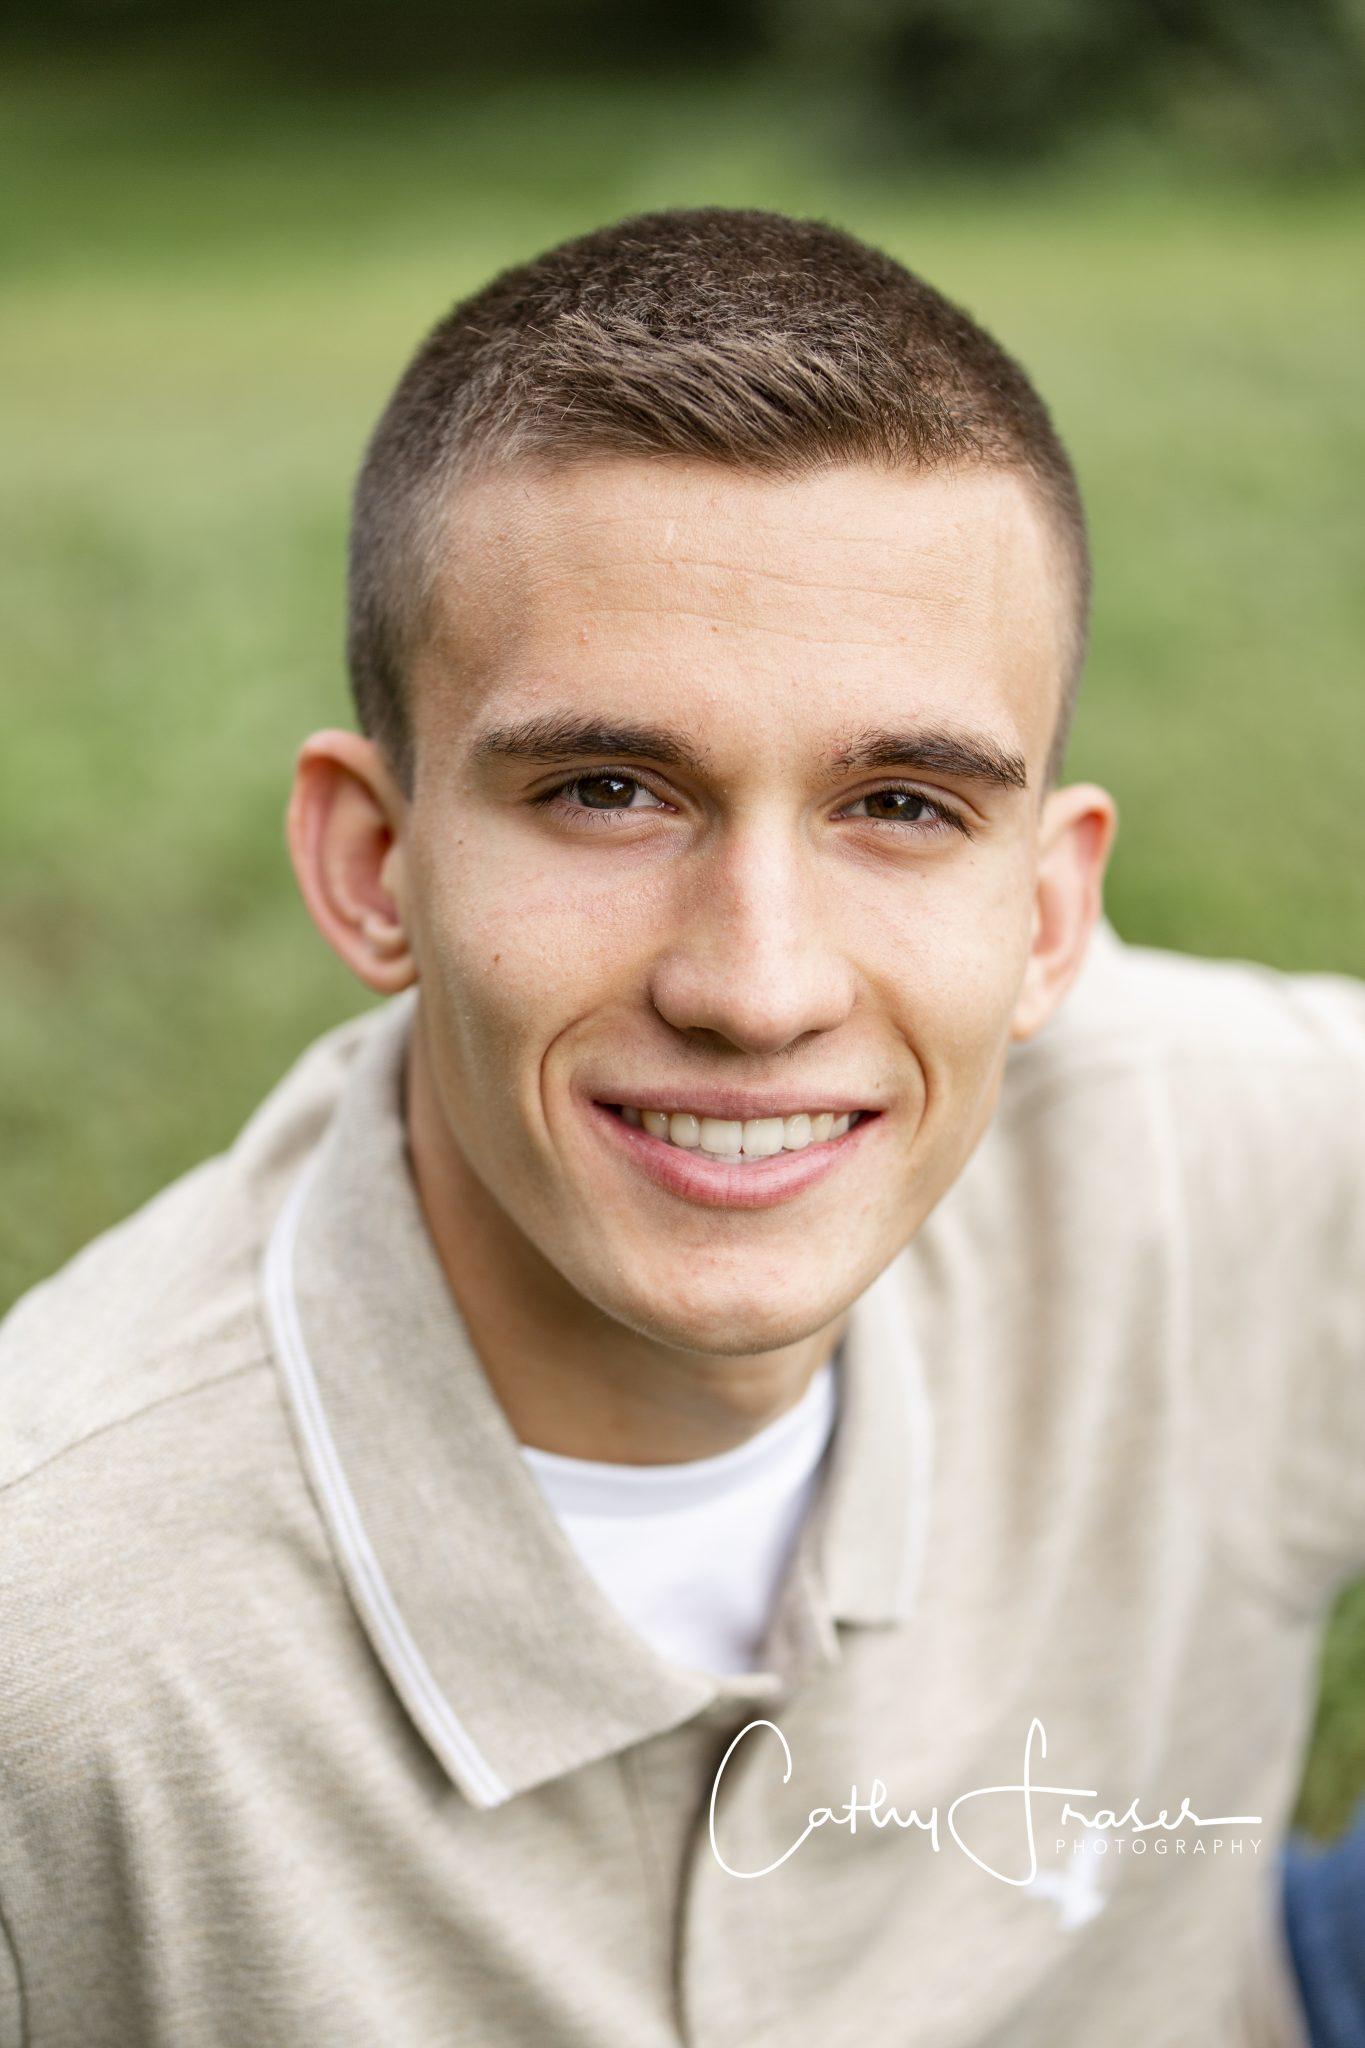 high school senior, senior pictures, professional headshot, professional senior photos, Webster, NY, natural light photography;